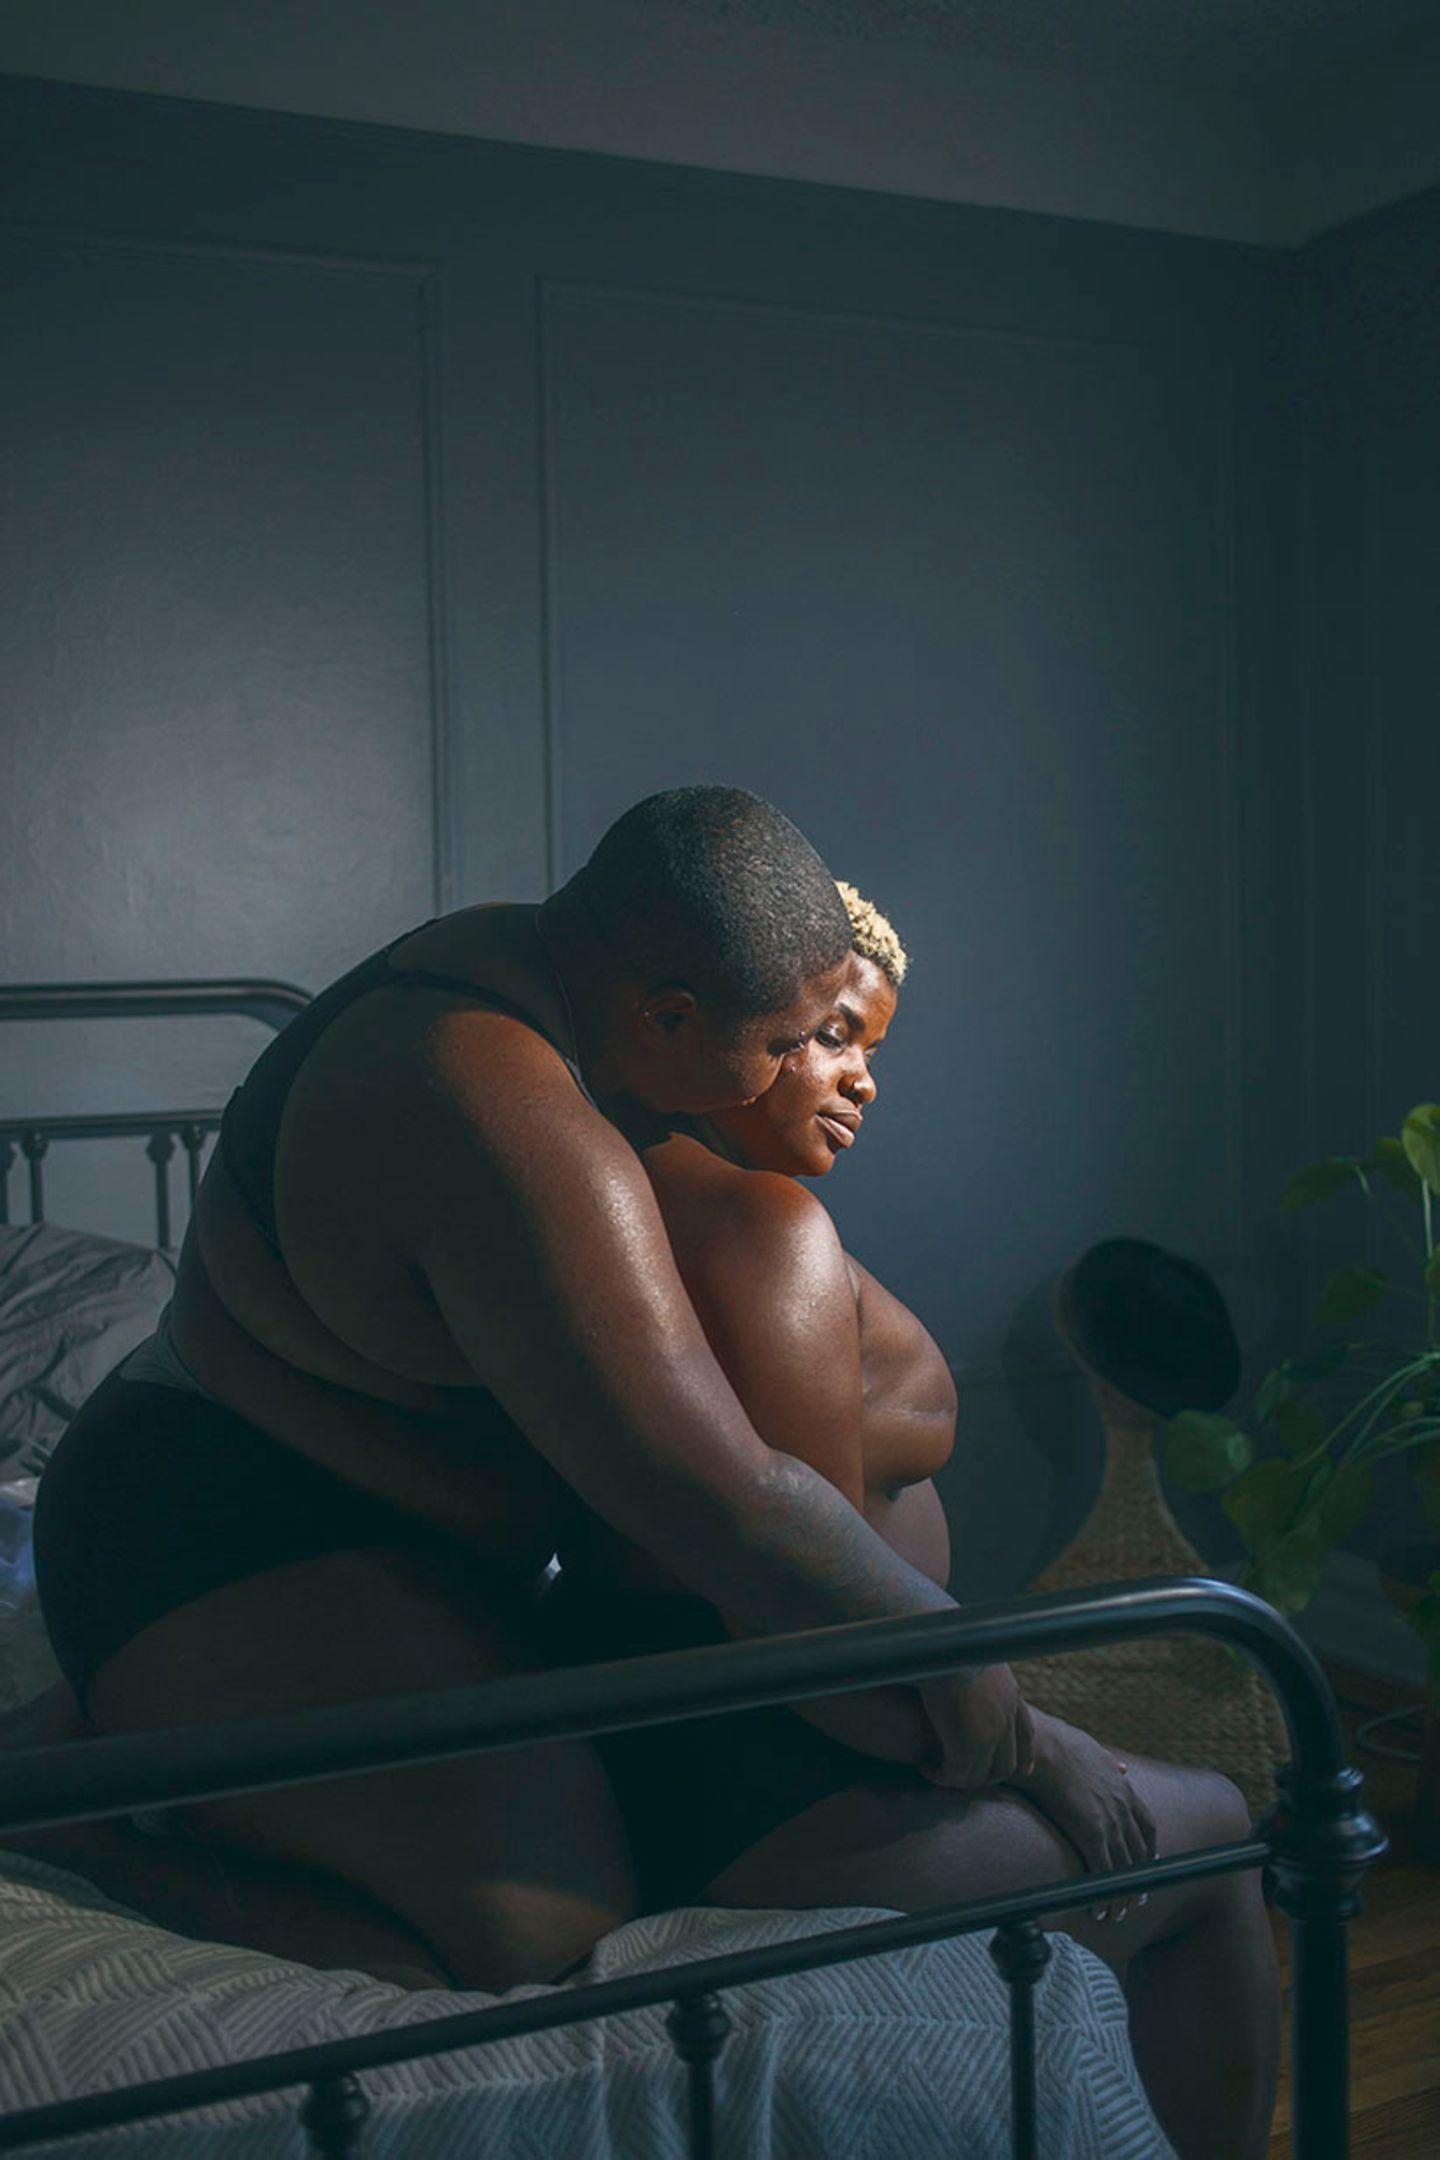 New Queer Photography: Paar sitzt auf Bett